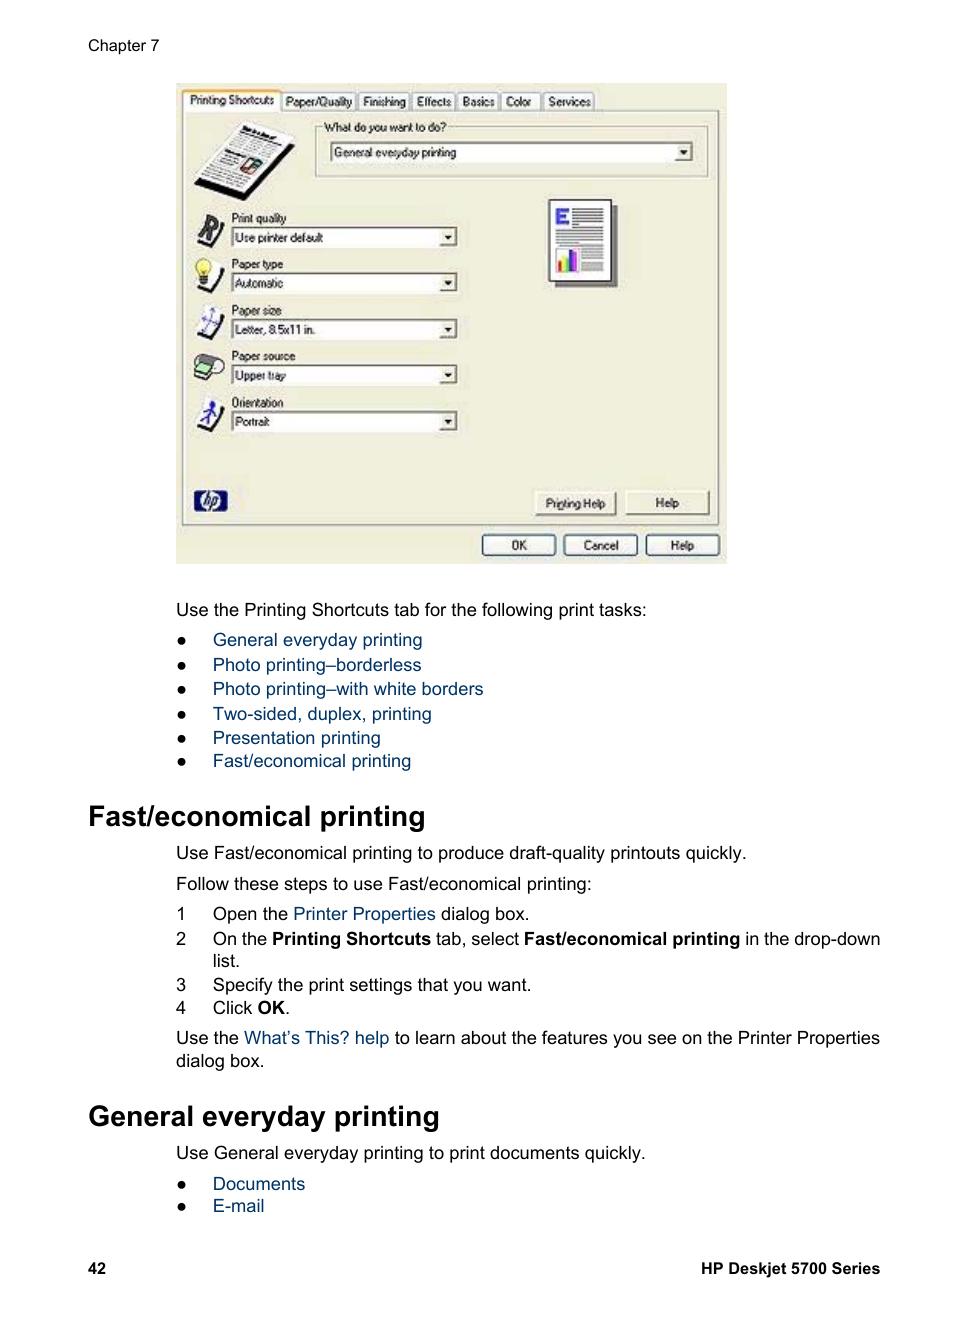 fast economical printing general everyday printing fast economical rh manualsdir com HP Deskjet 5740 HP 5700 Desktop